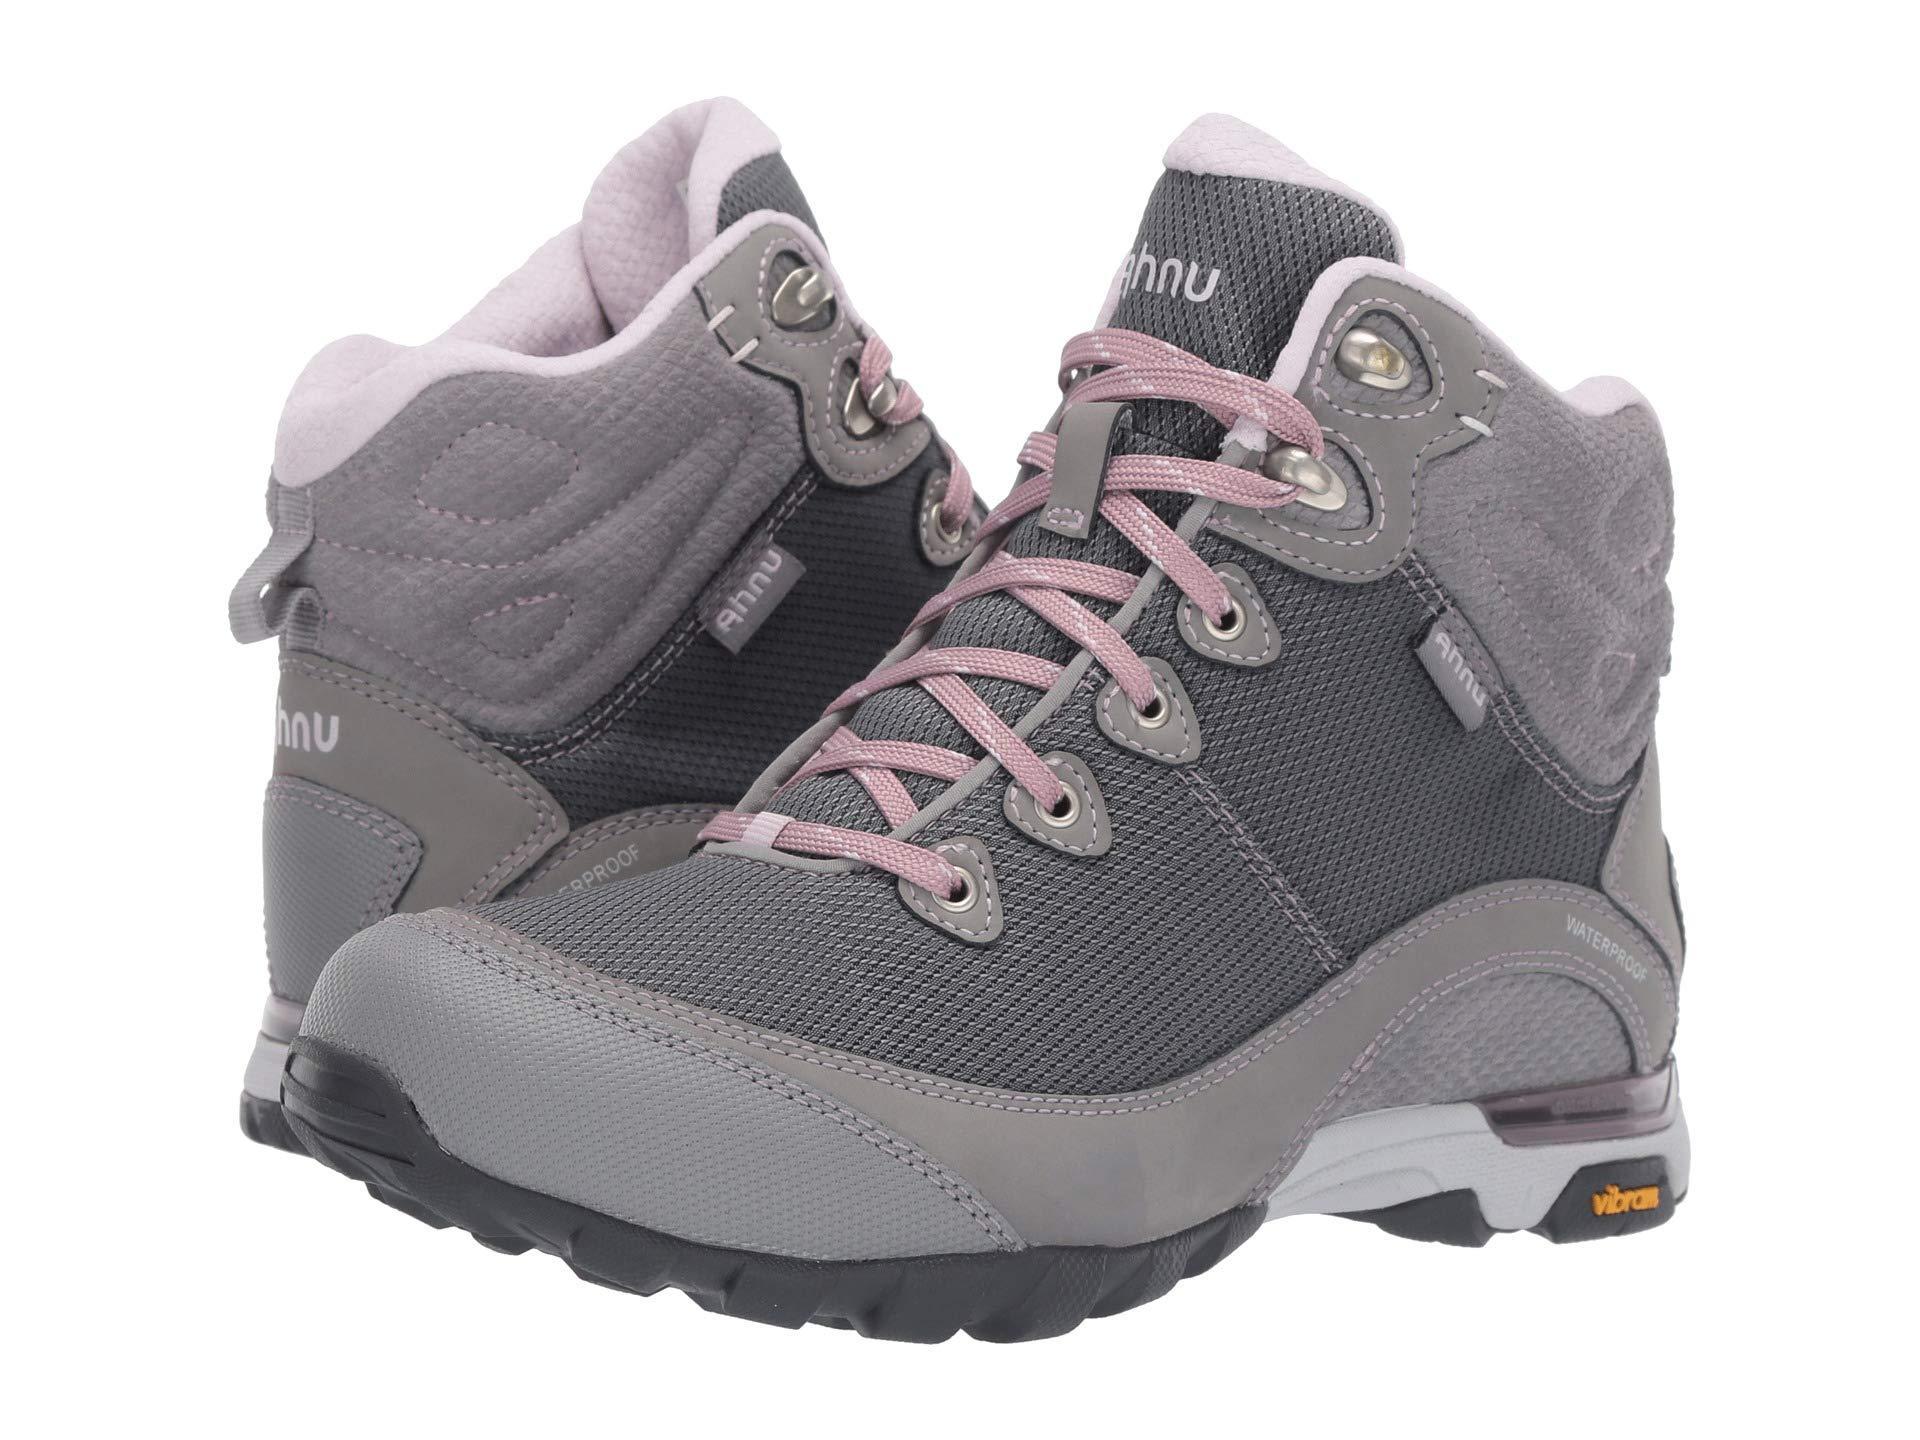 0506c58ead1 Lyst - Teva Sugarpine Ii Wp Boot Ripstop (black/green Bay) Women's Boots